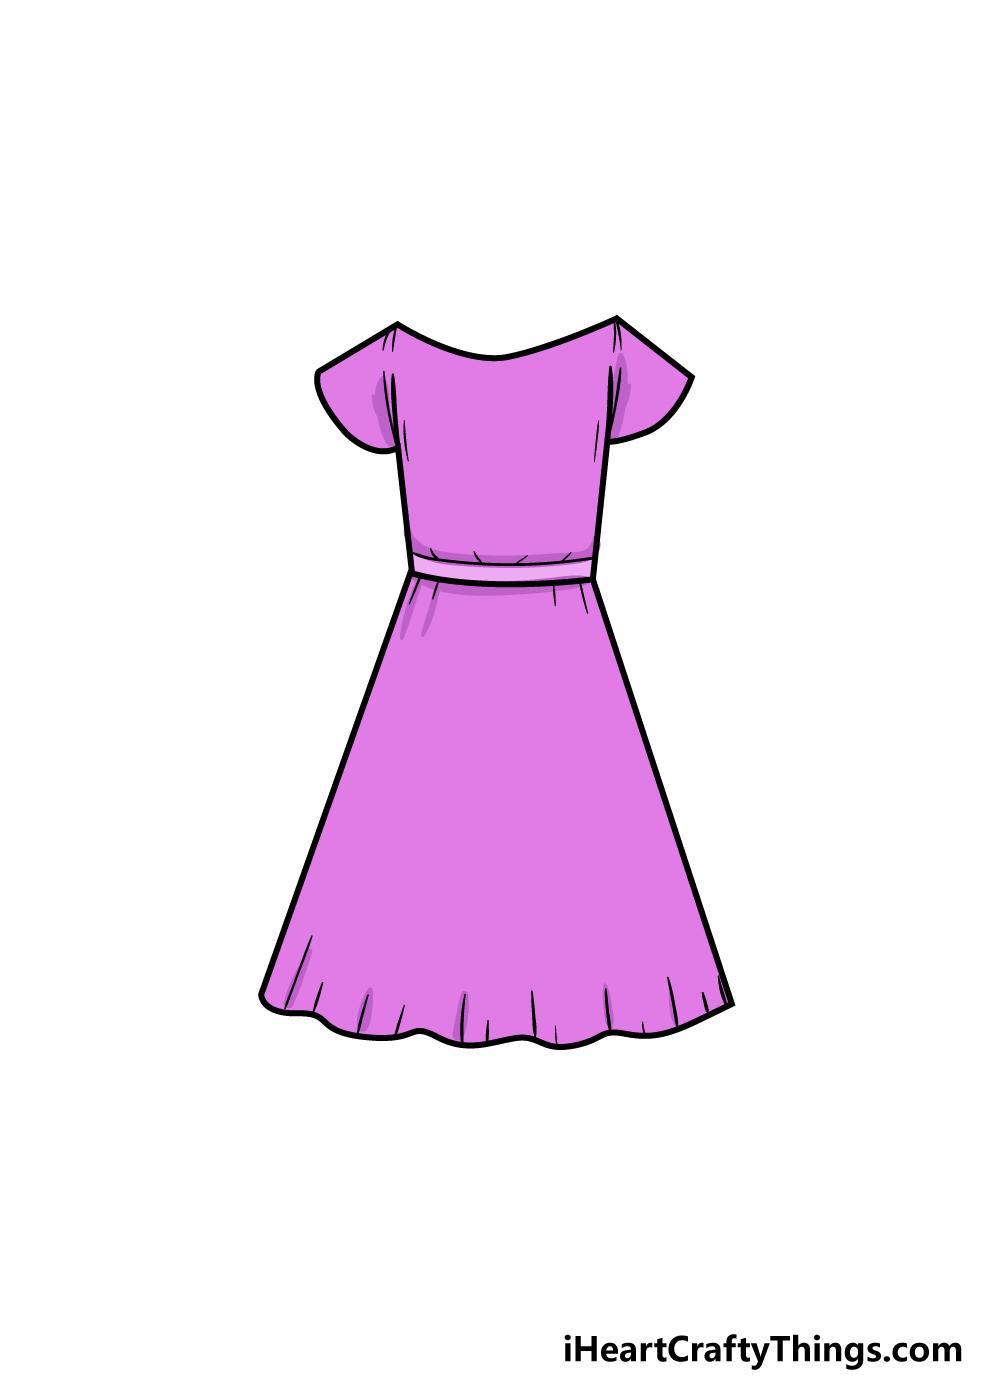 dress drawing step 7